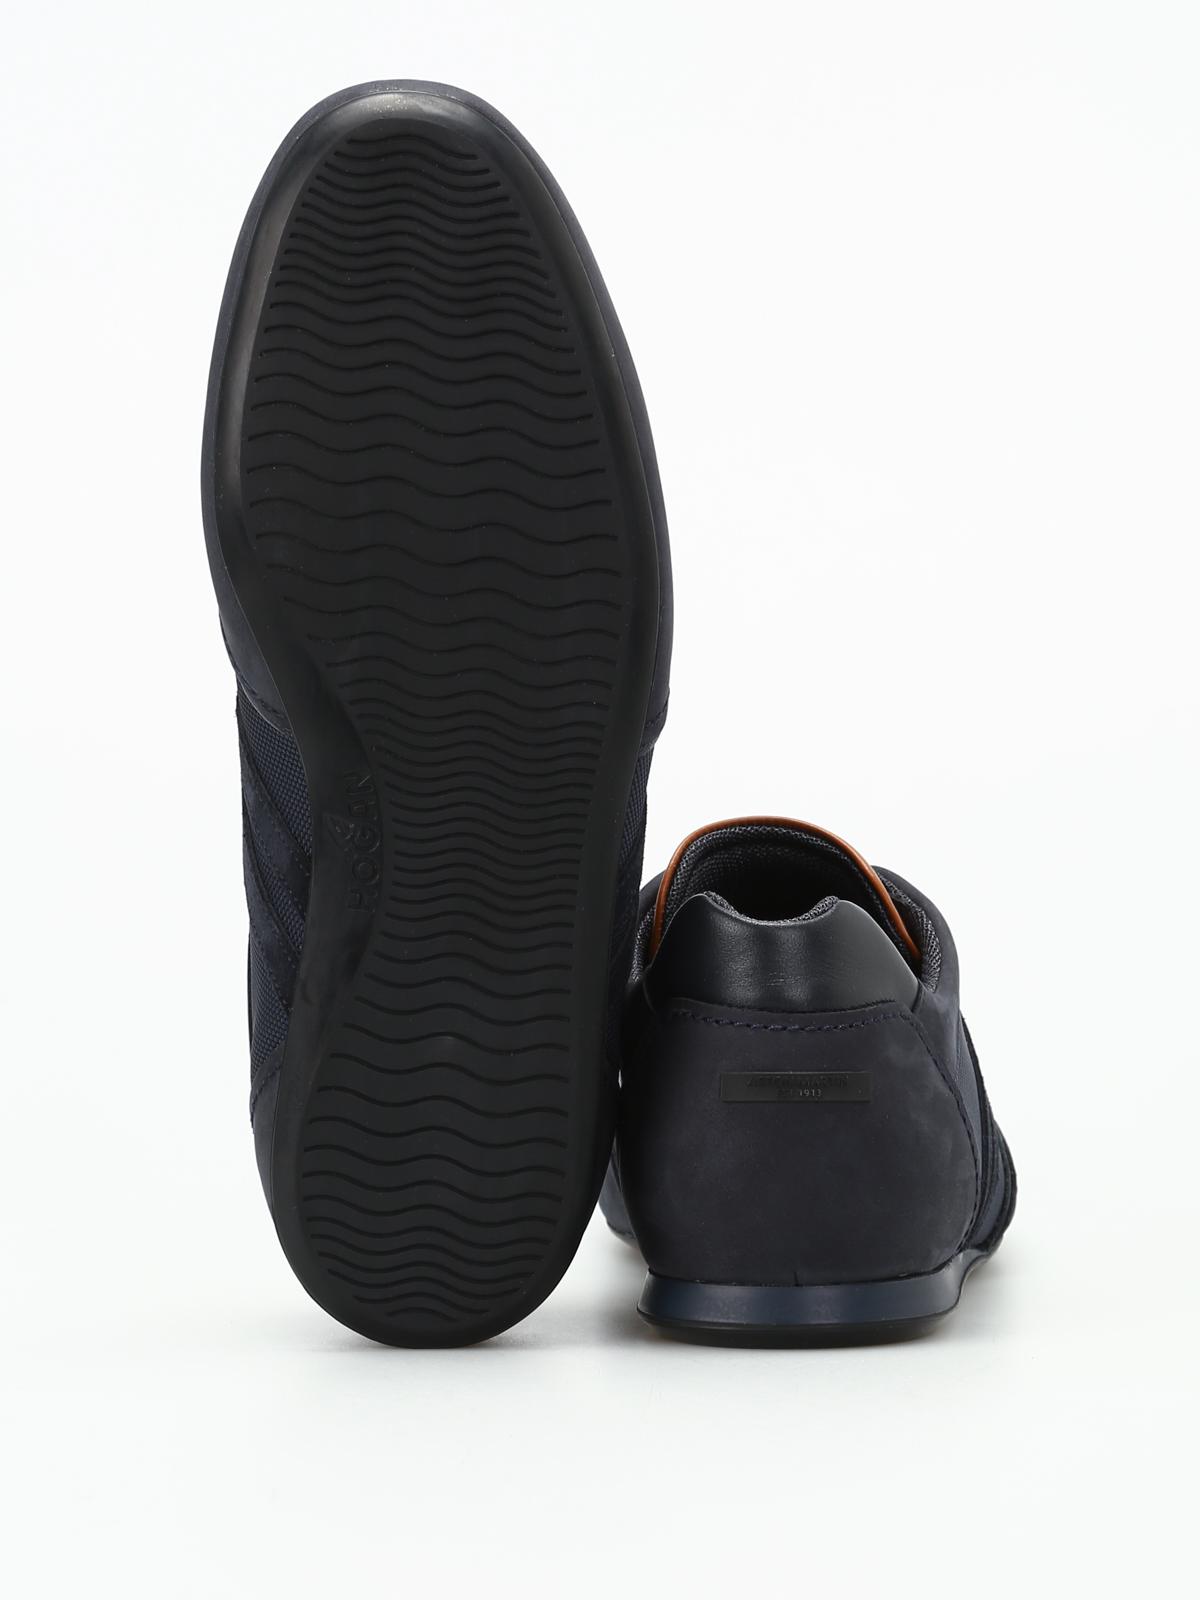 Hogan Olympia Aston Martin Blue Sneakers اسپرت اسنیکرز H1m0570z910hms8430